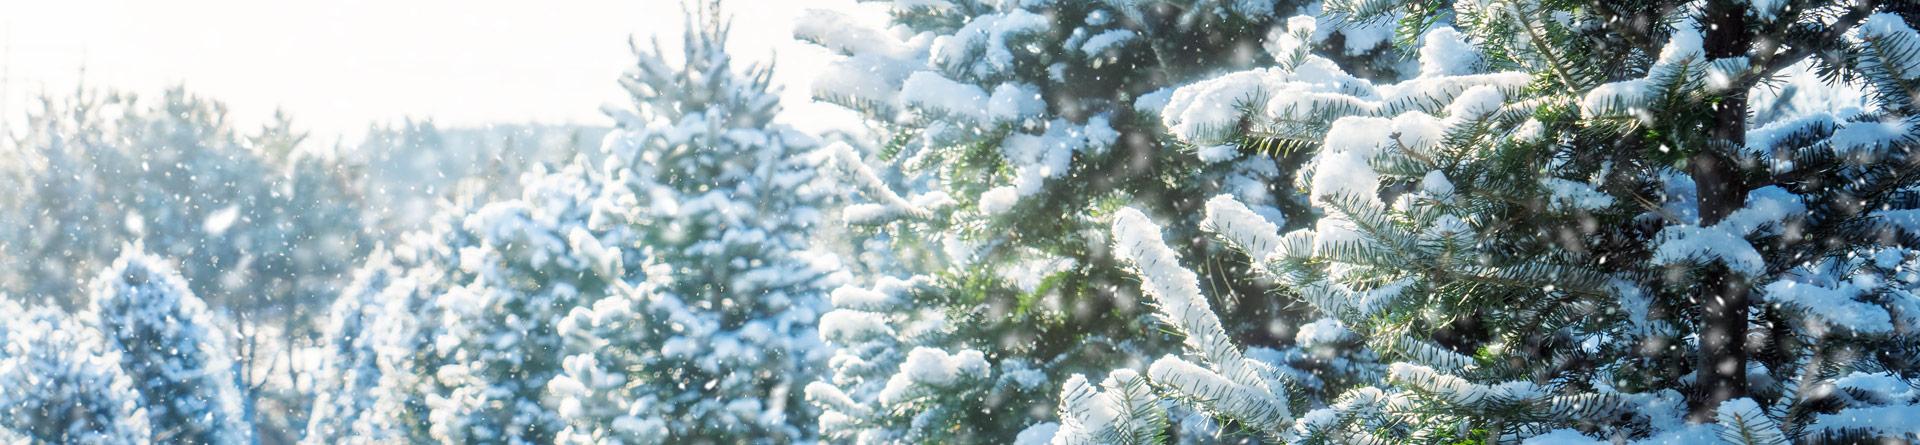 Snow falling at a Christmas tree farm